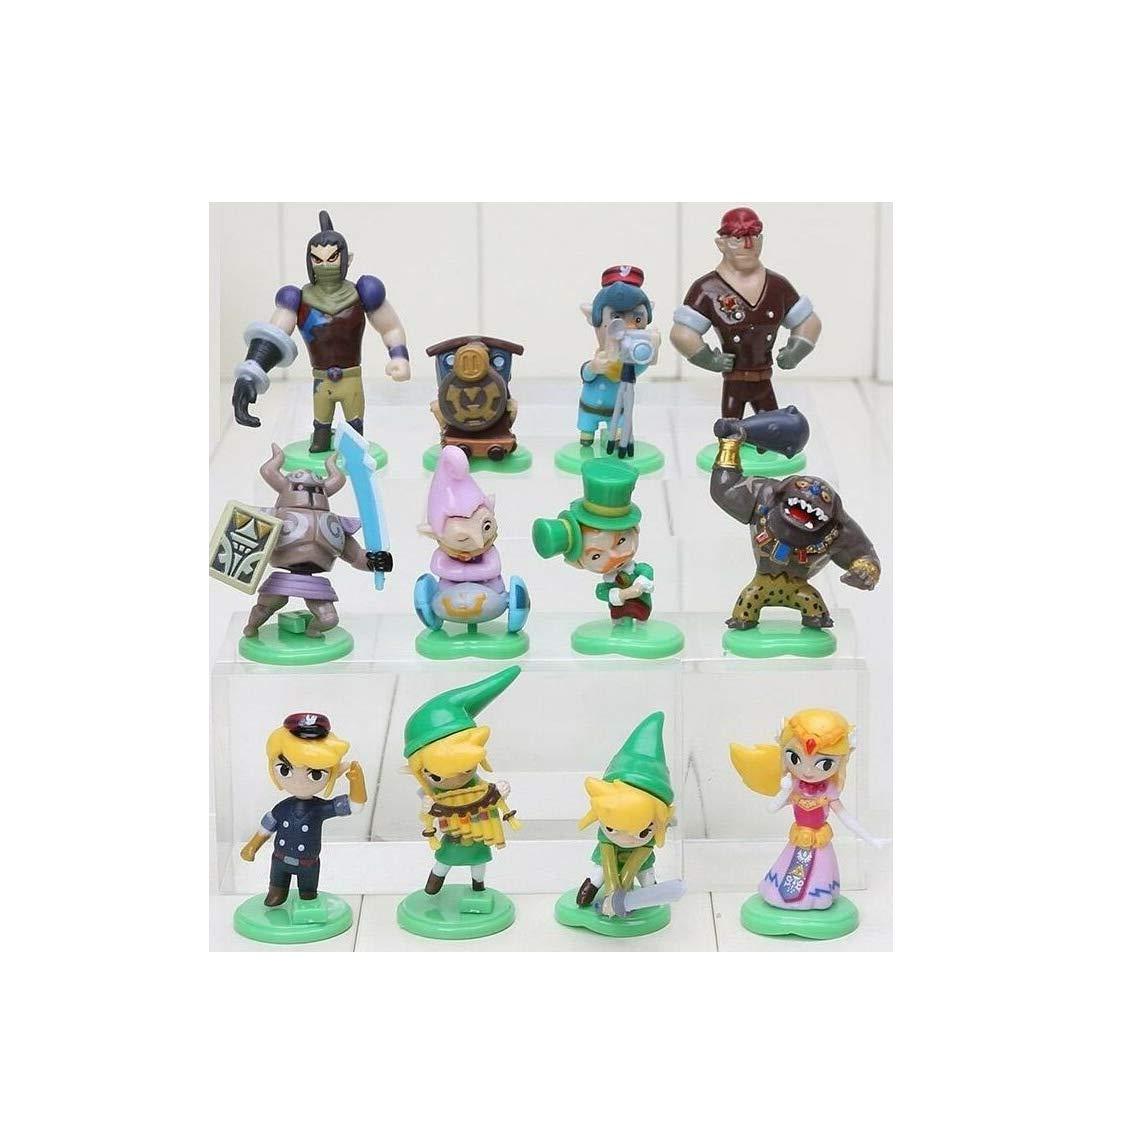 Amazon.com: Love Gift Legendary Videogame Link 12 Figures ...